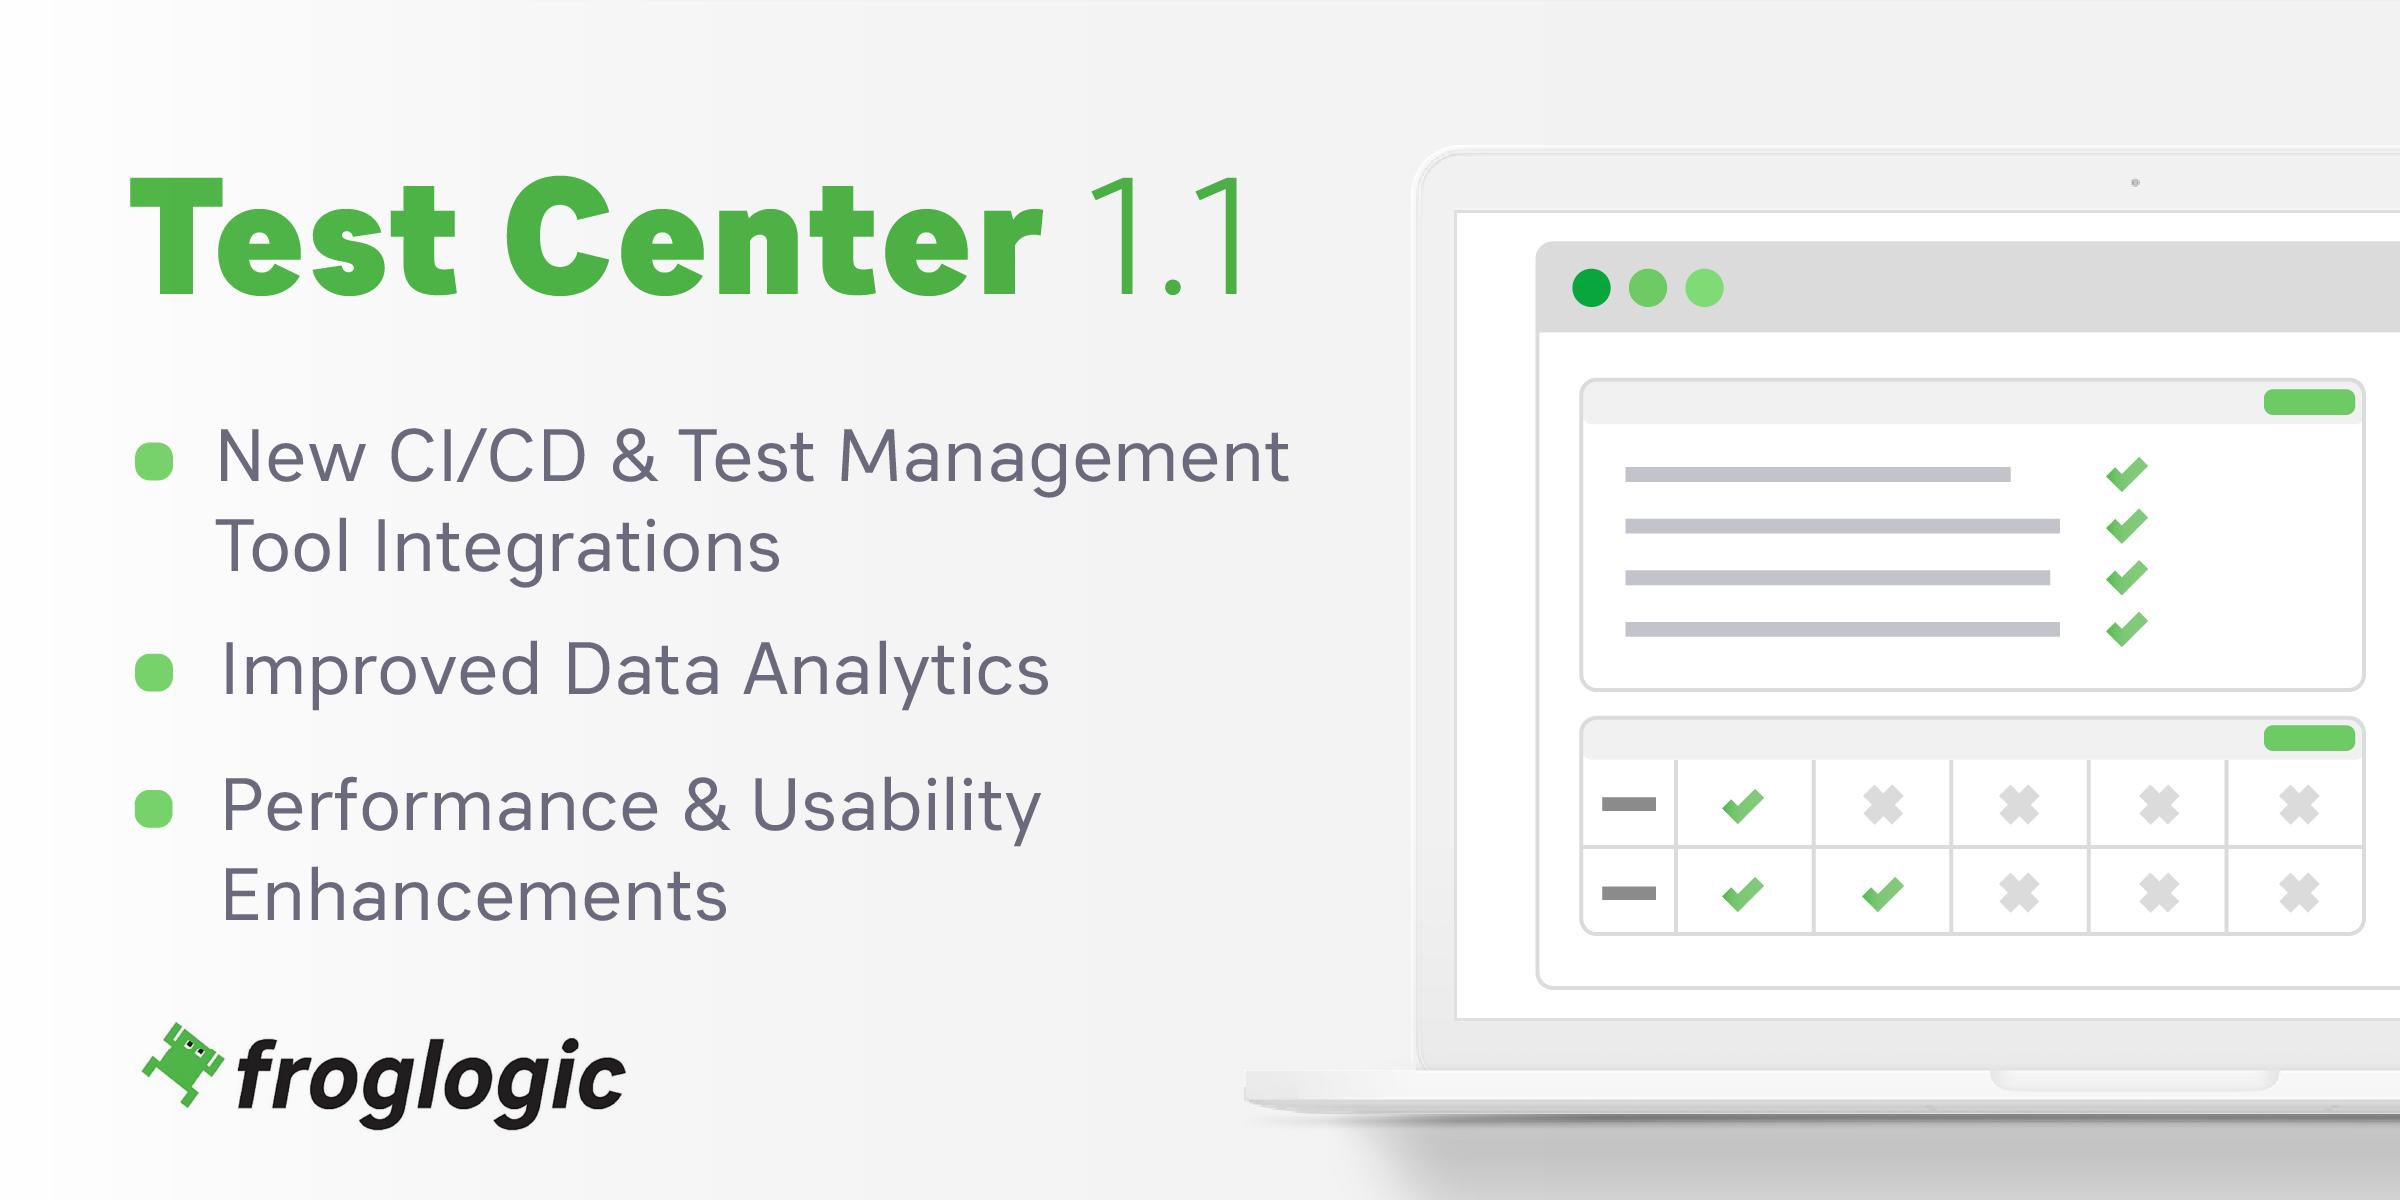 Test Center 1.1 Release